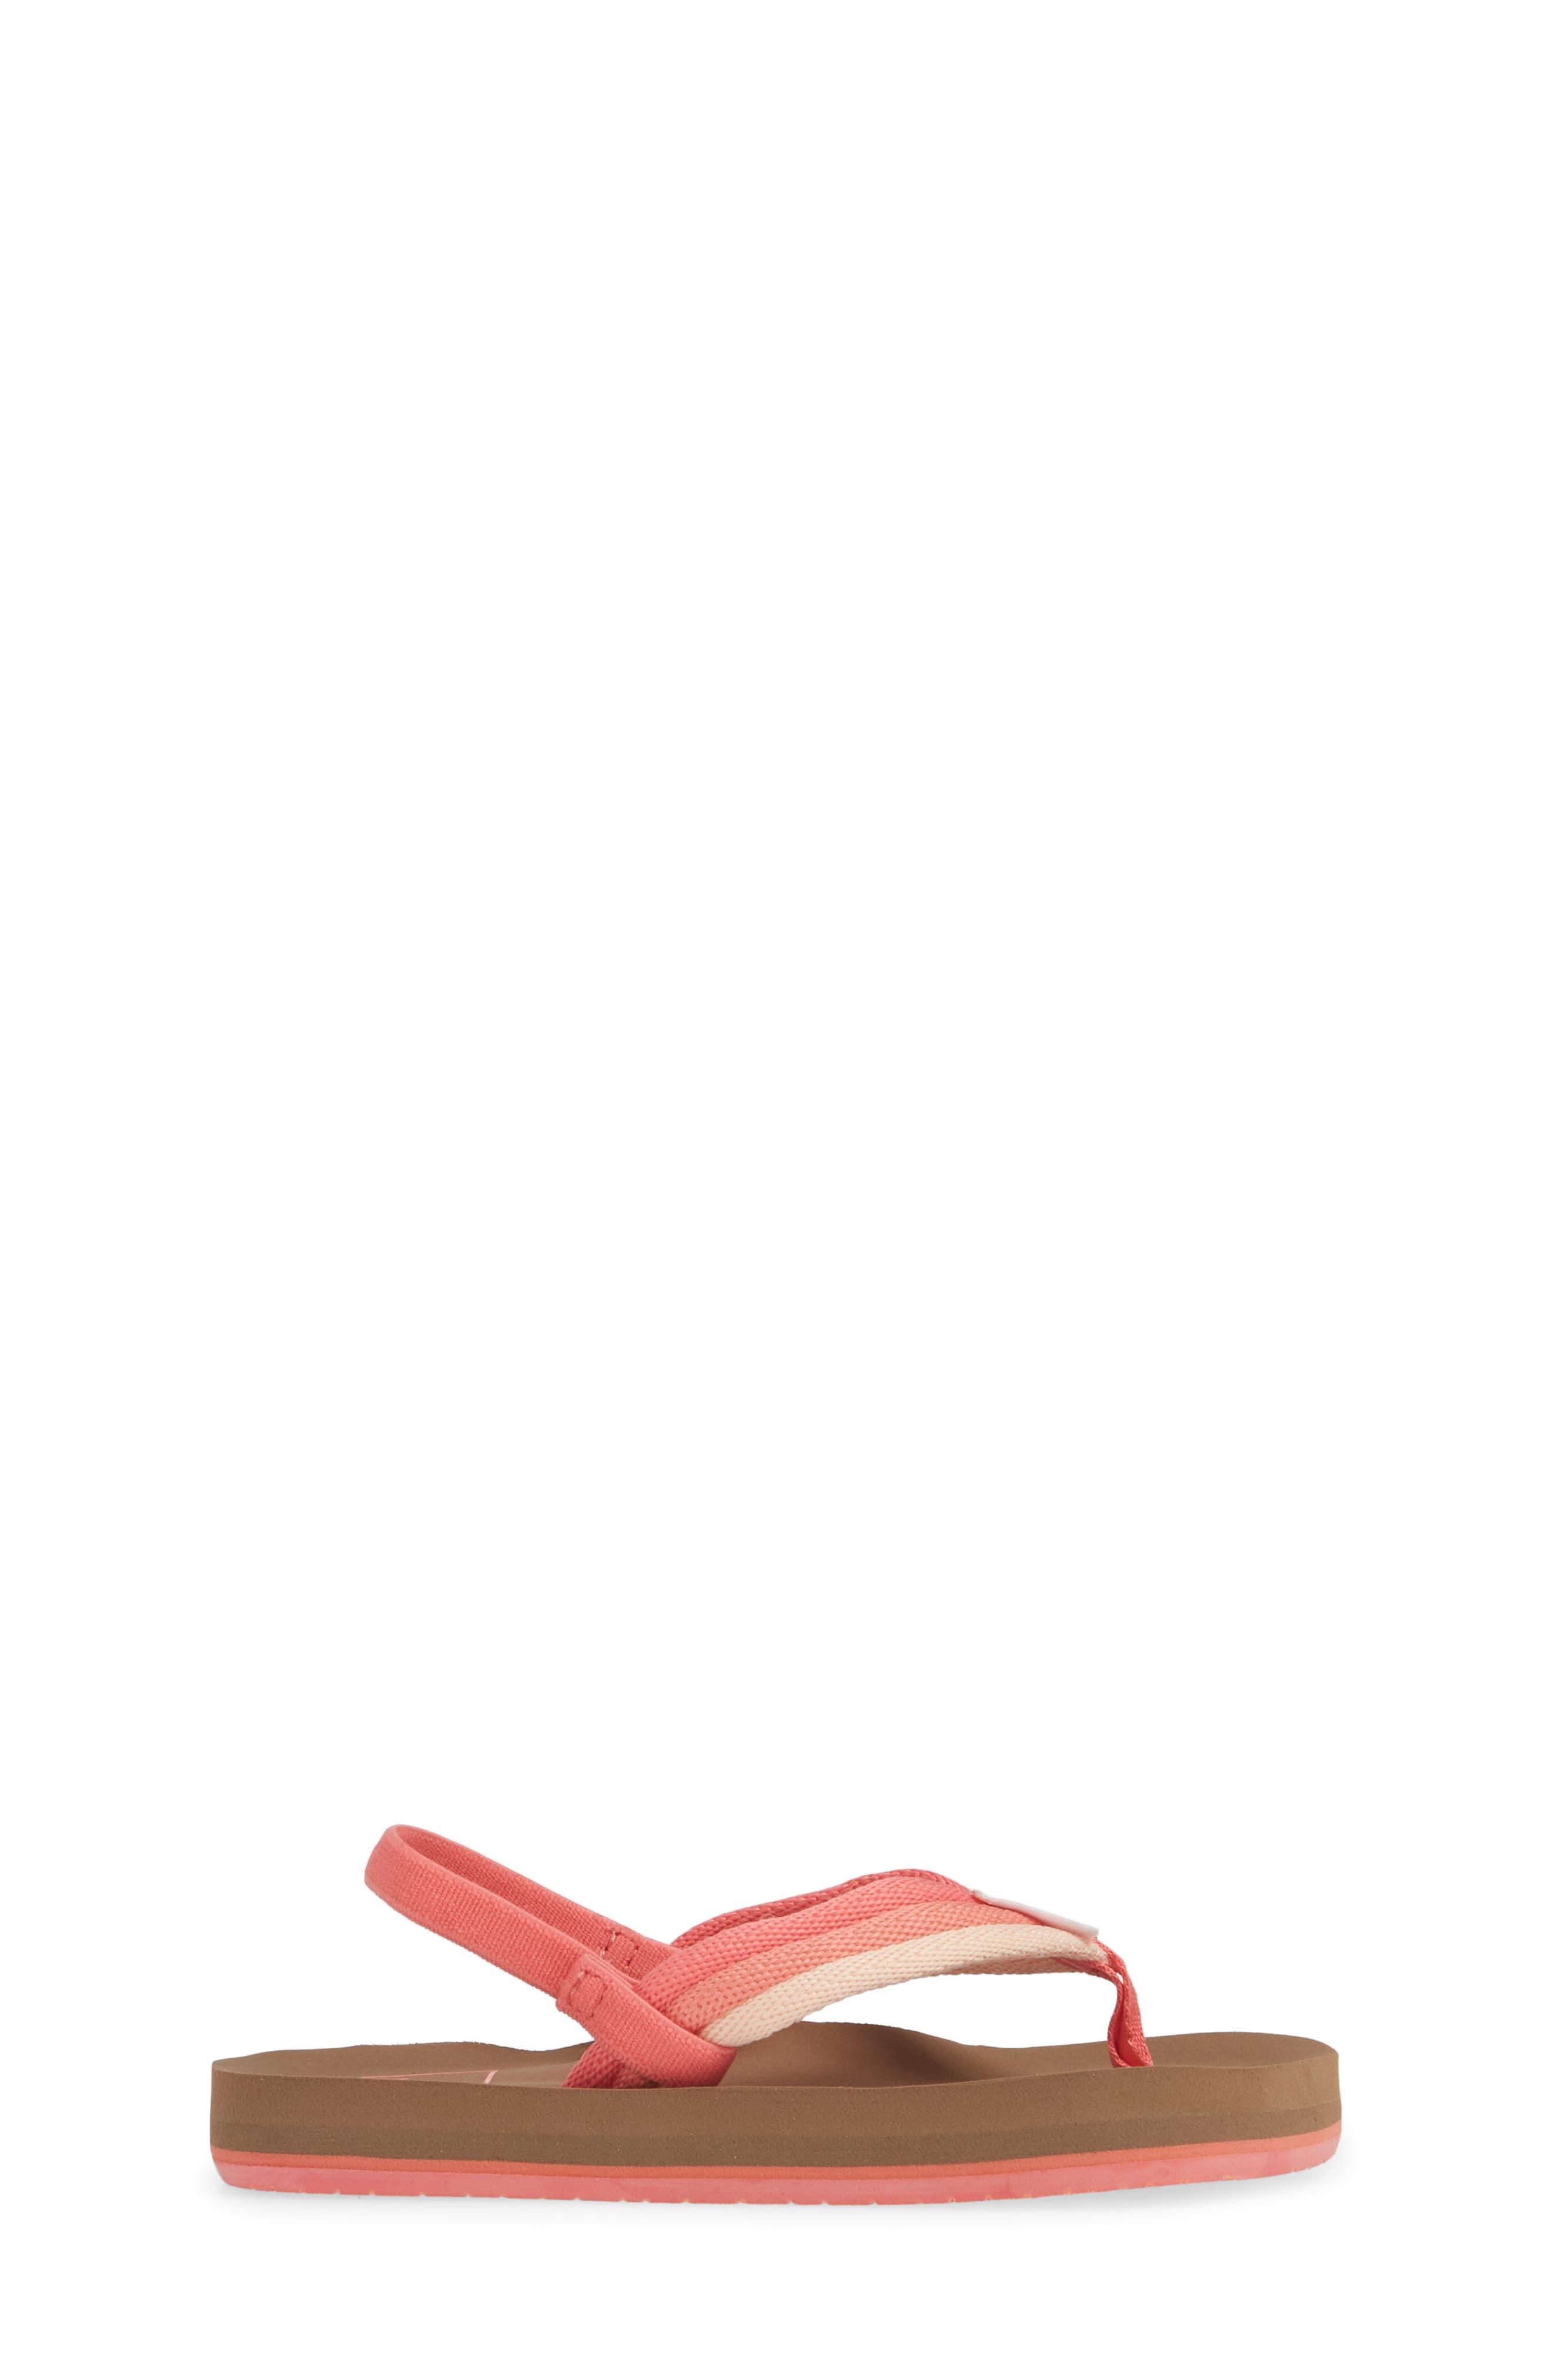 REEF, Little Ahi Beach Thong Sandal, Alternate thumbnail 3, color, RASPBERRY